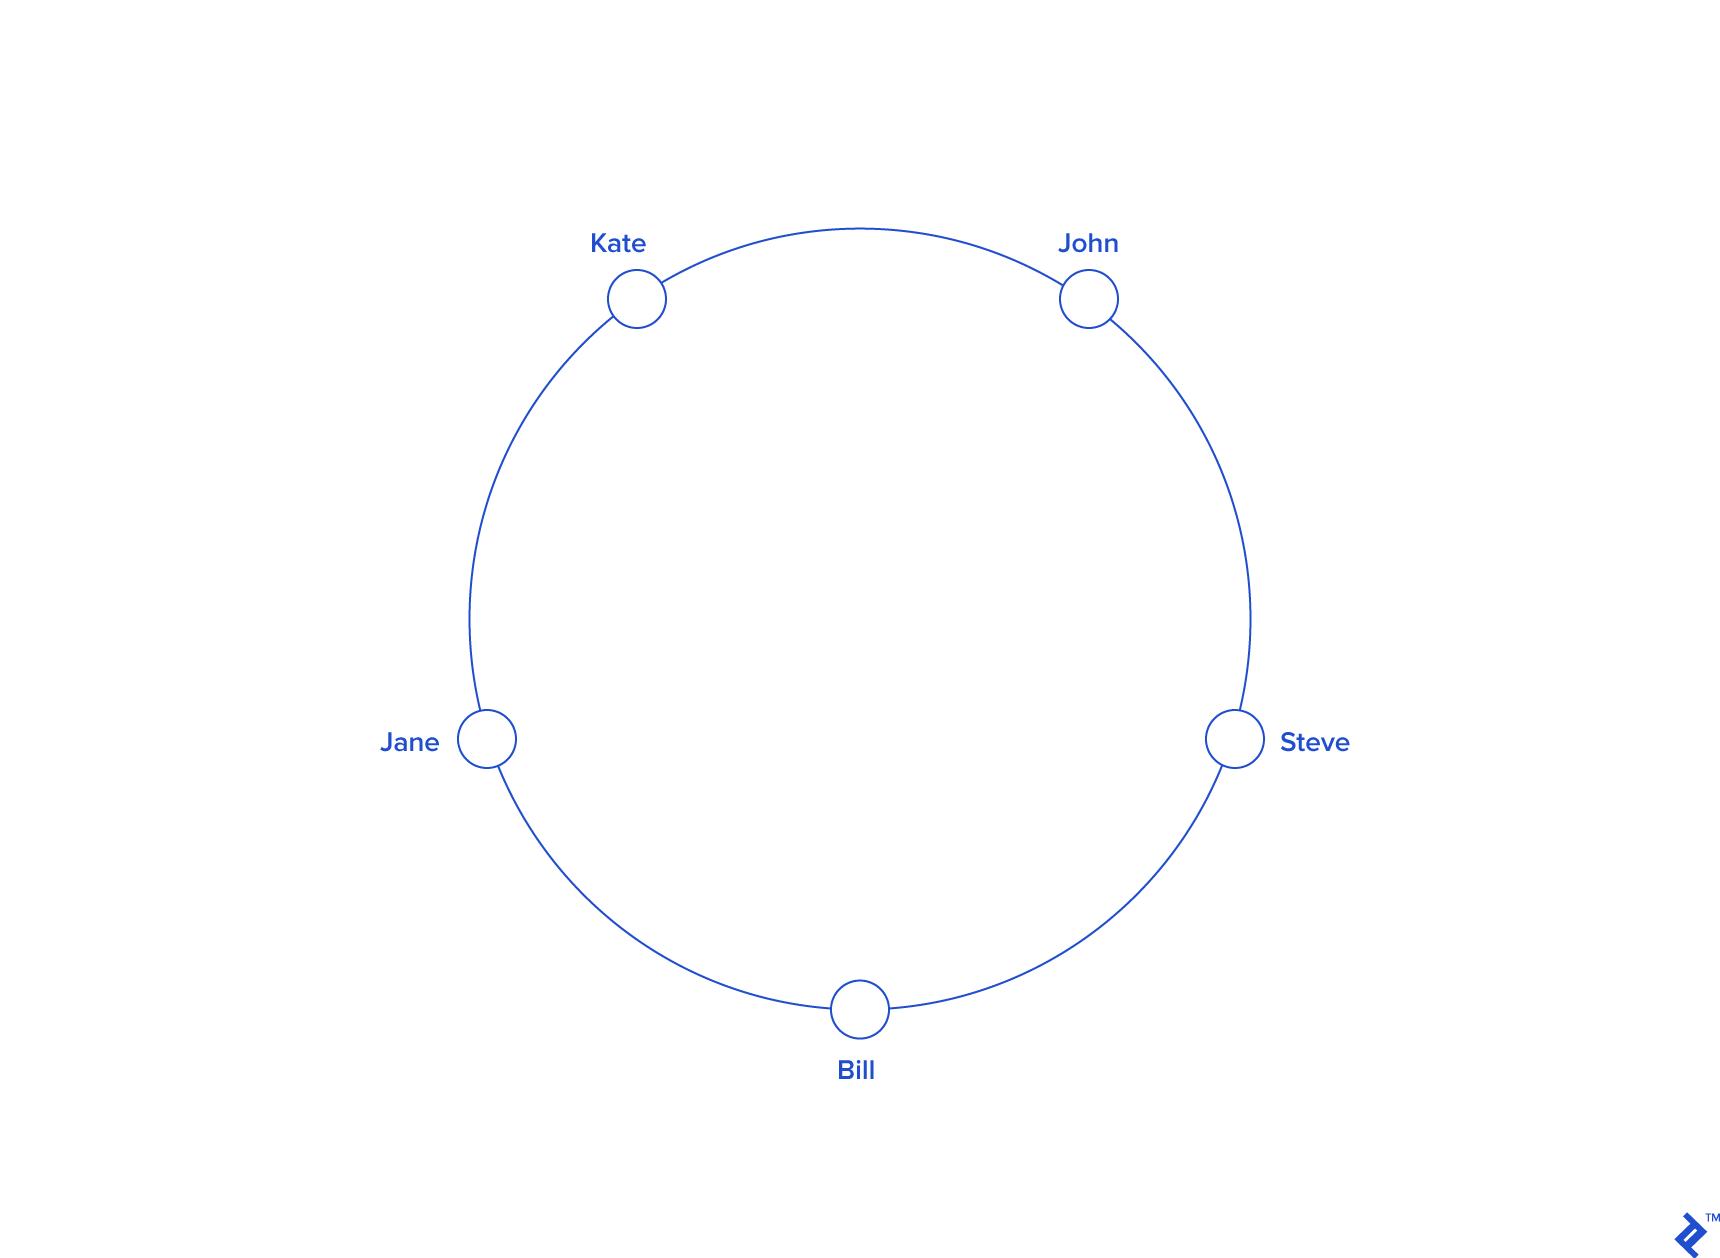 Consistent Hashing Example: Keys